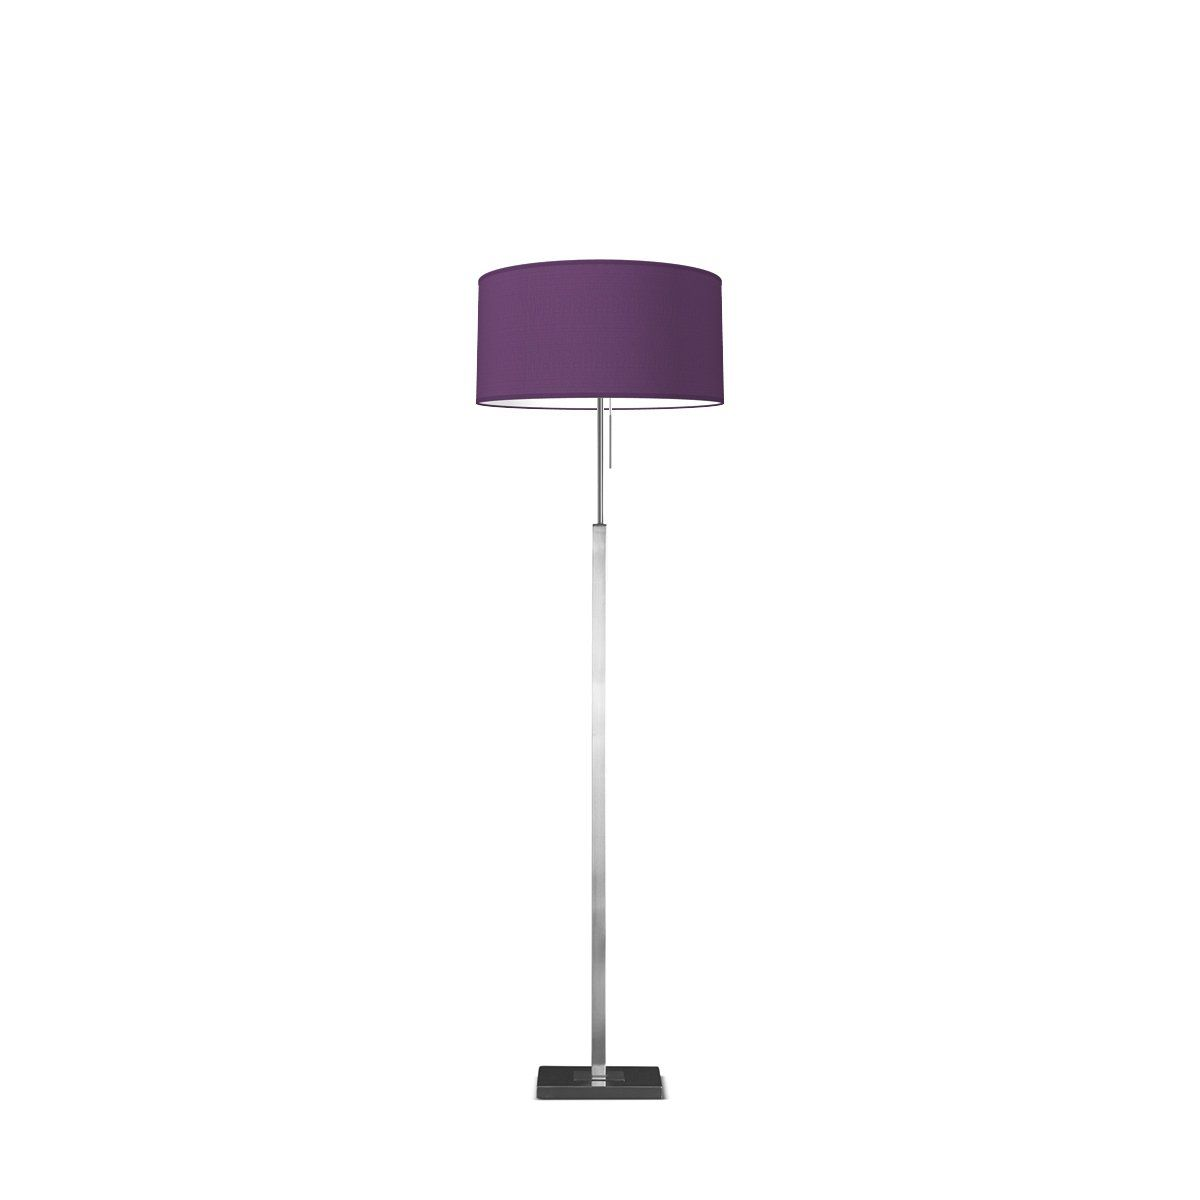 vloerlamp Pull bling Ø 50 cm - paars